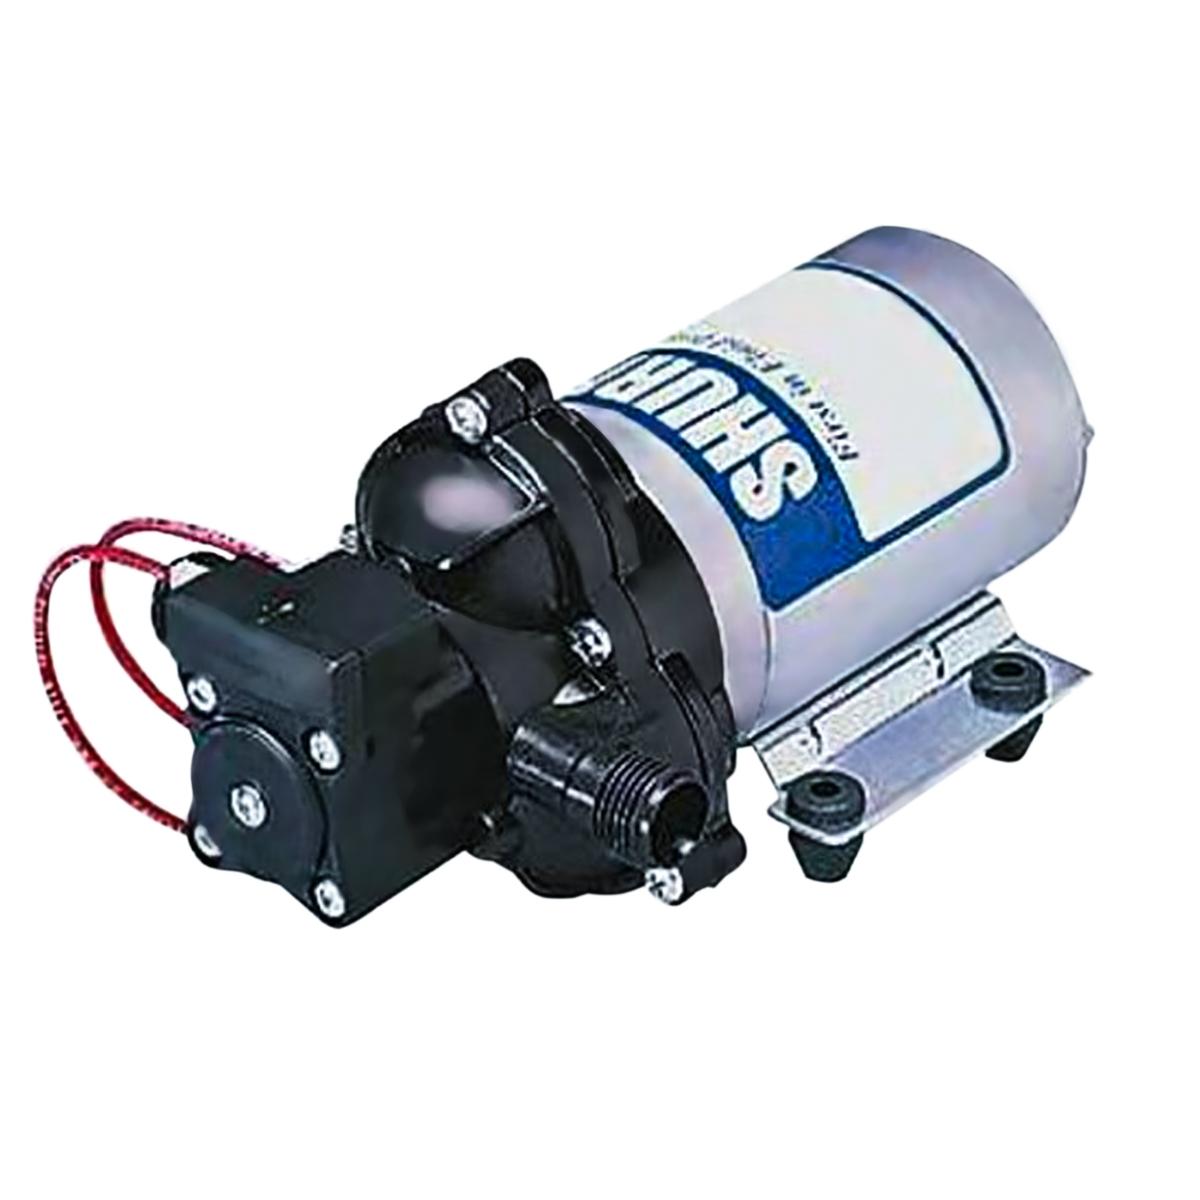 Shurflo Water Pump >> SHURflo pump 2088-554-144